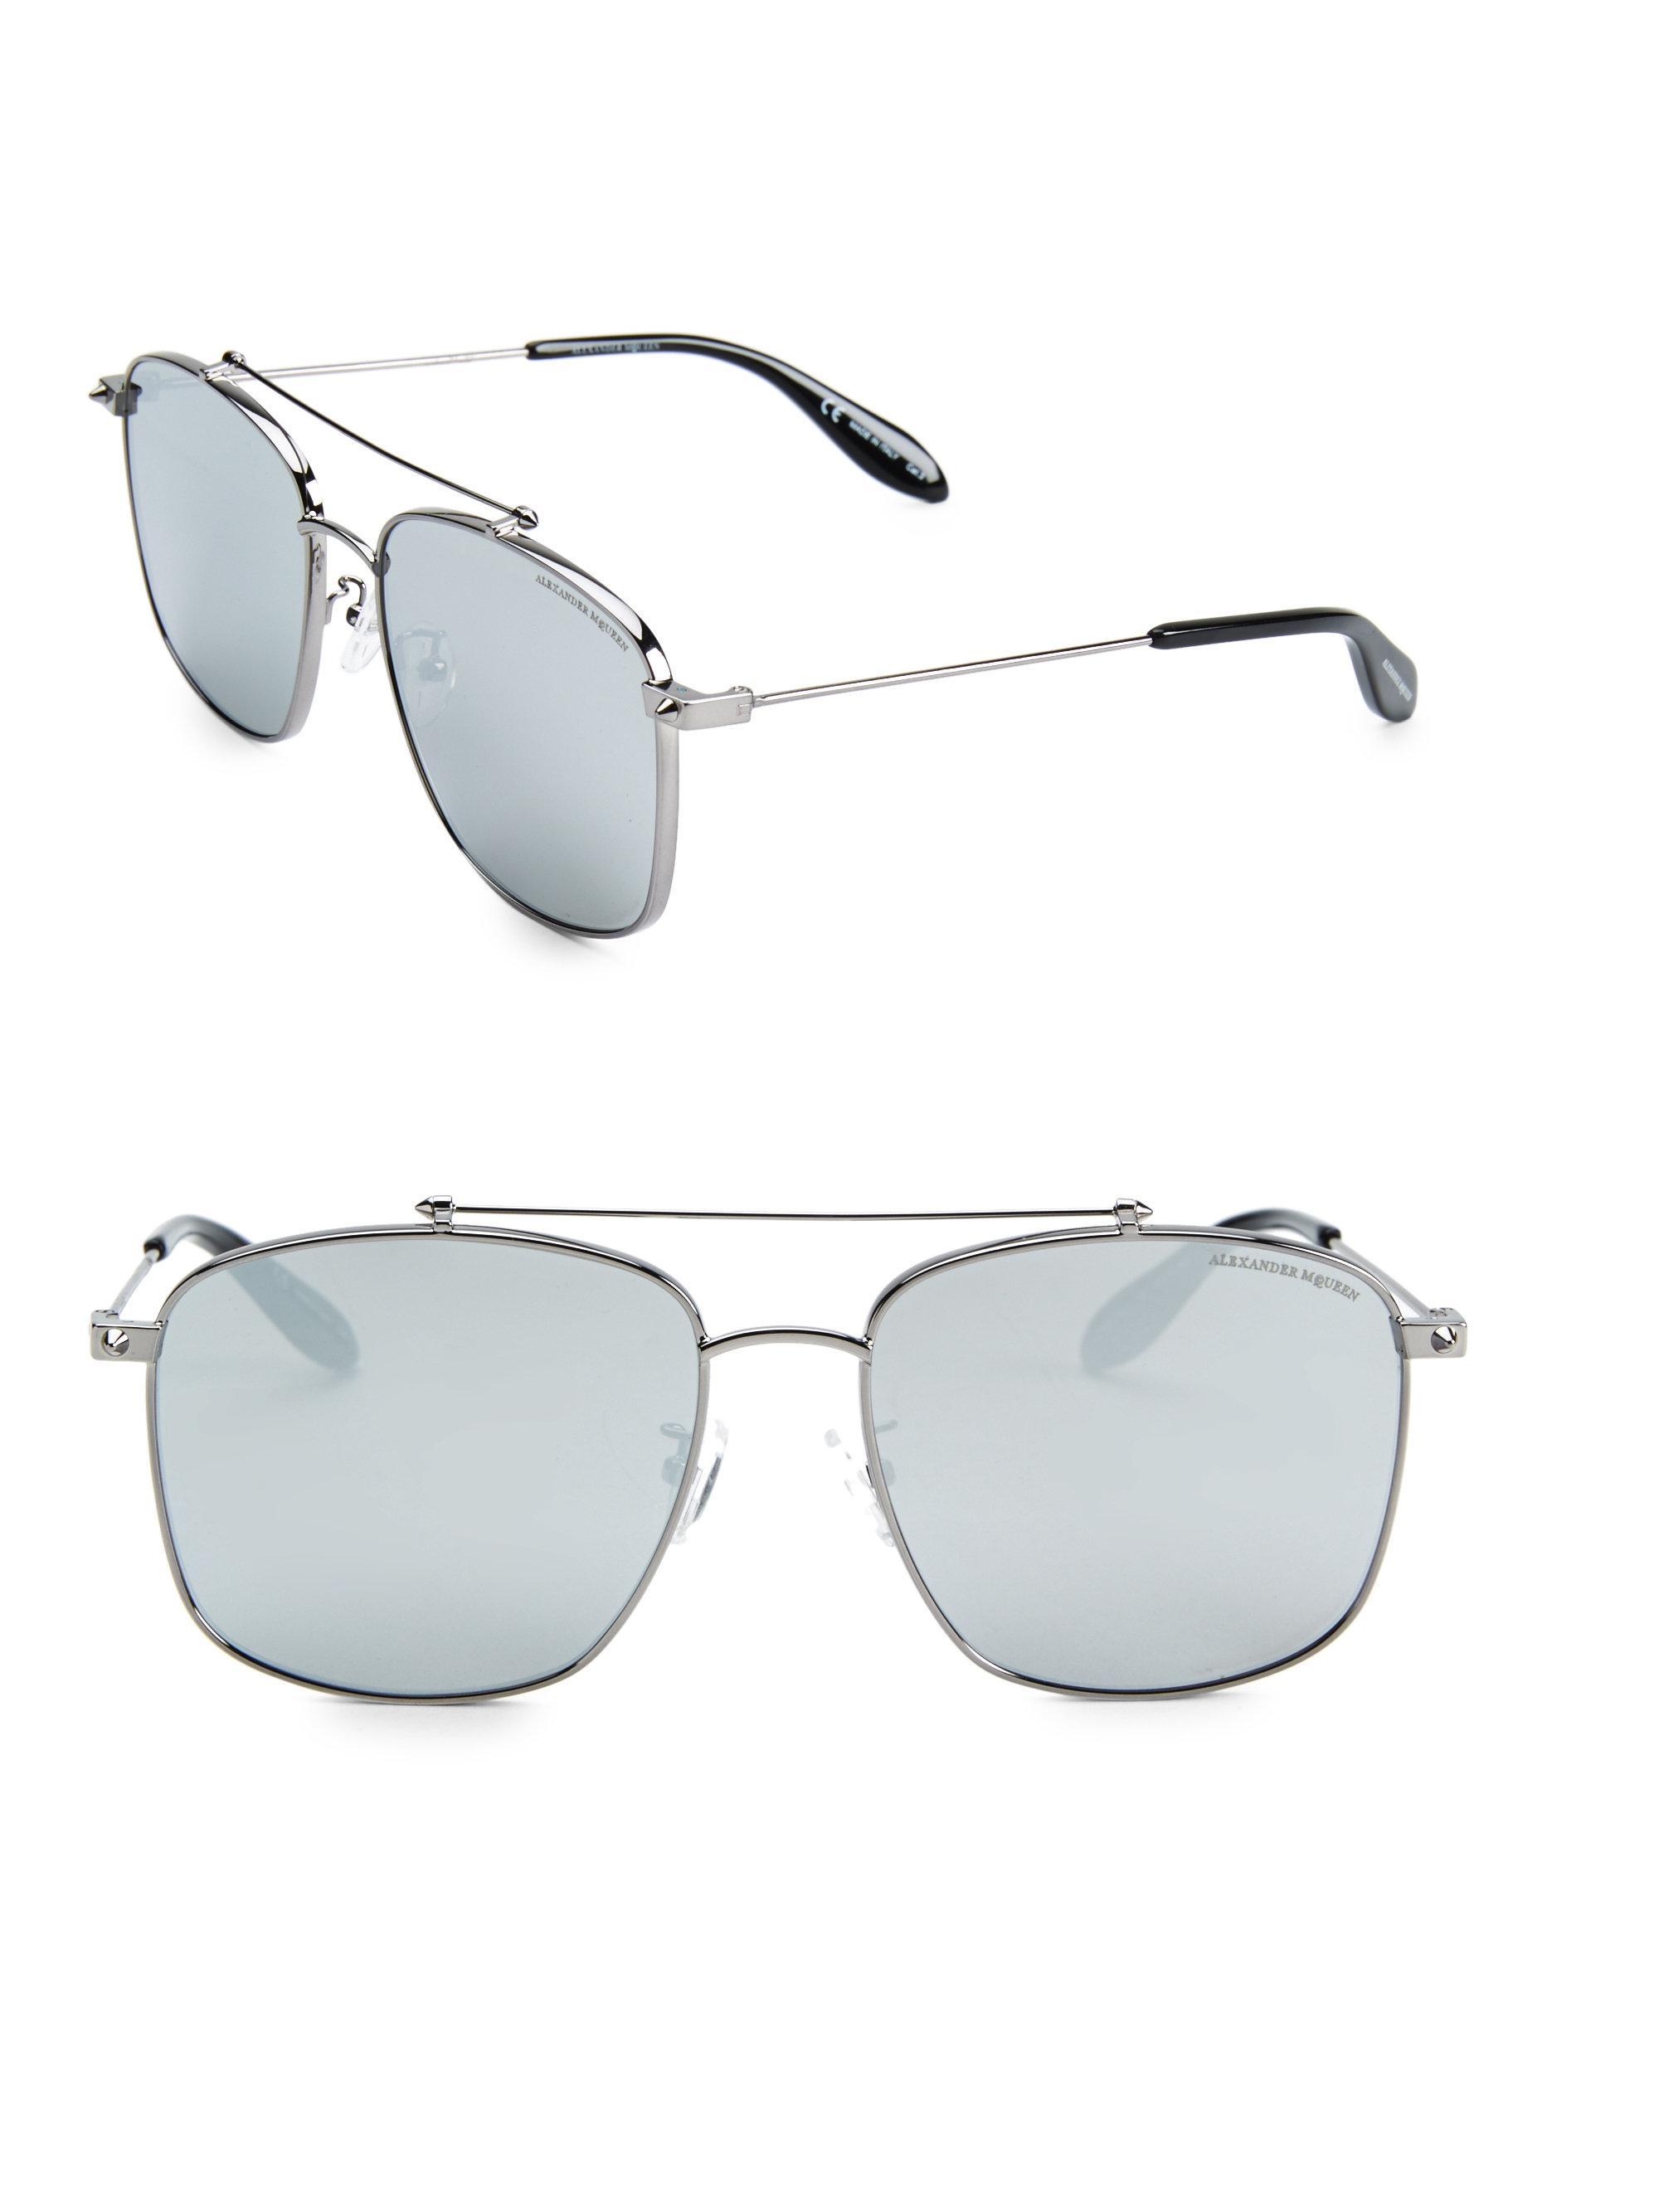 00554b96027 Lyst - Alexander Mcqueen 59mm Square Sunglasses for Men